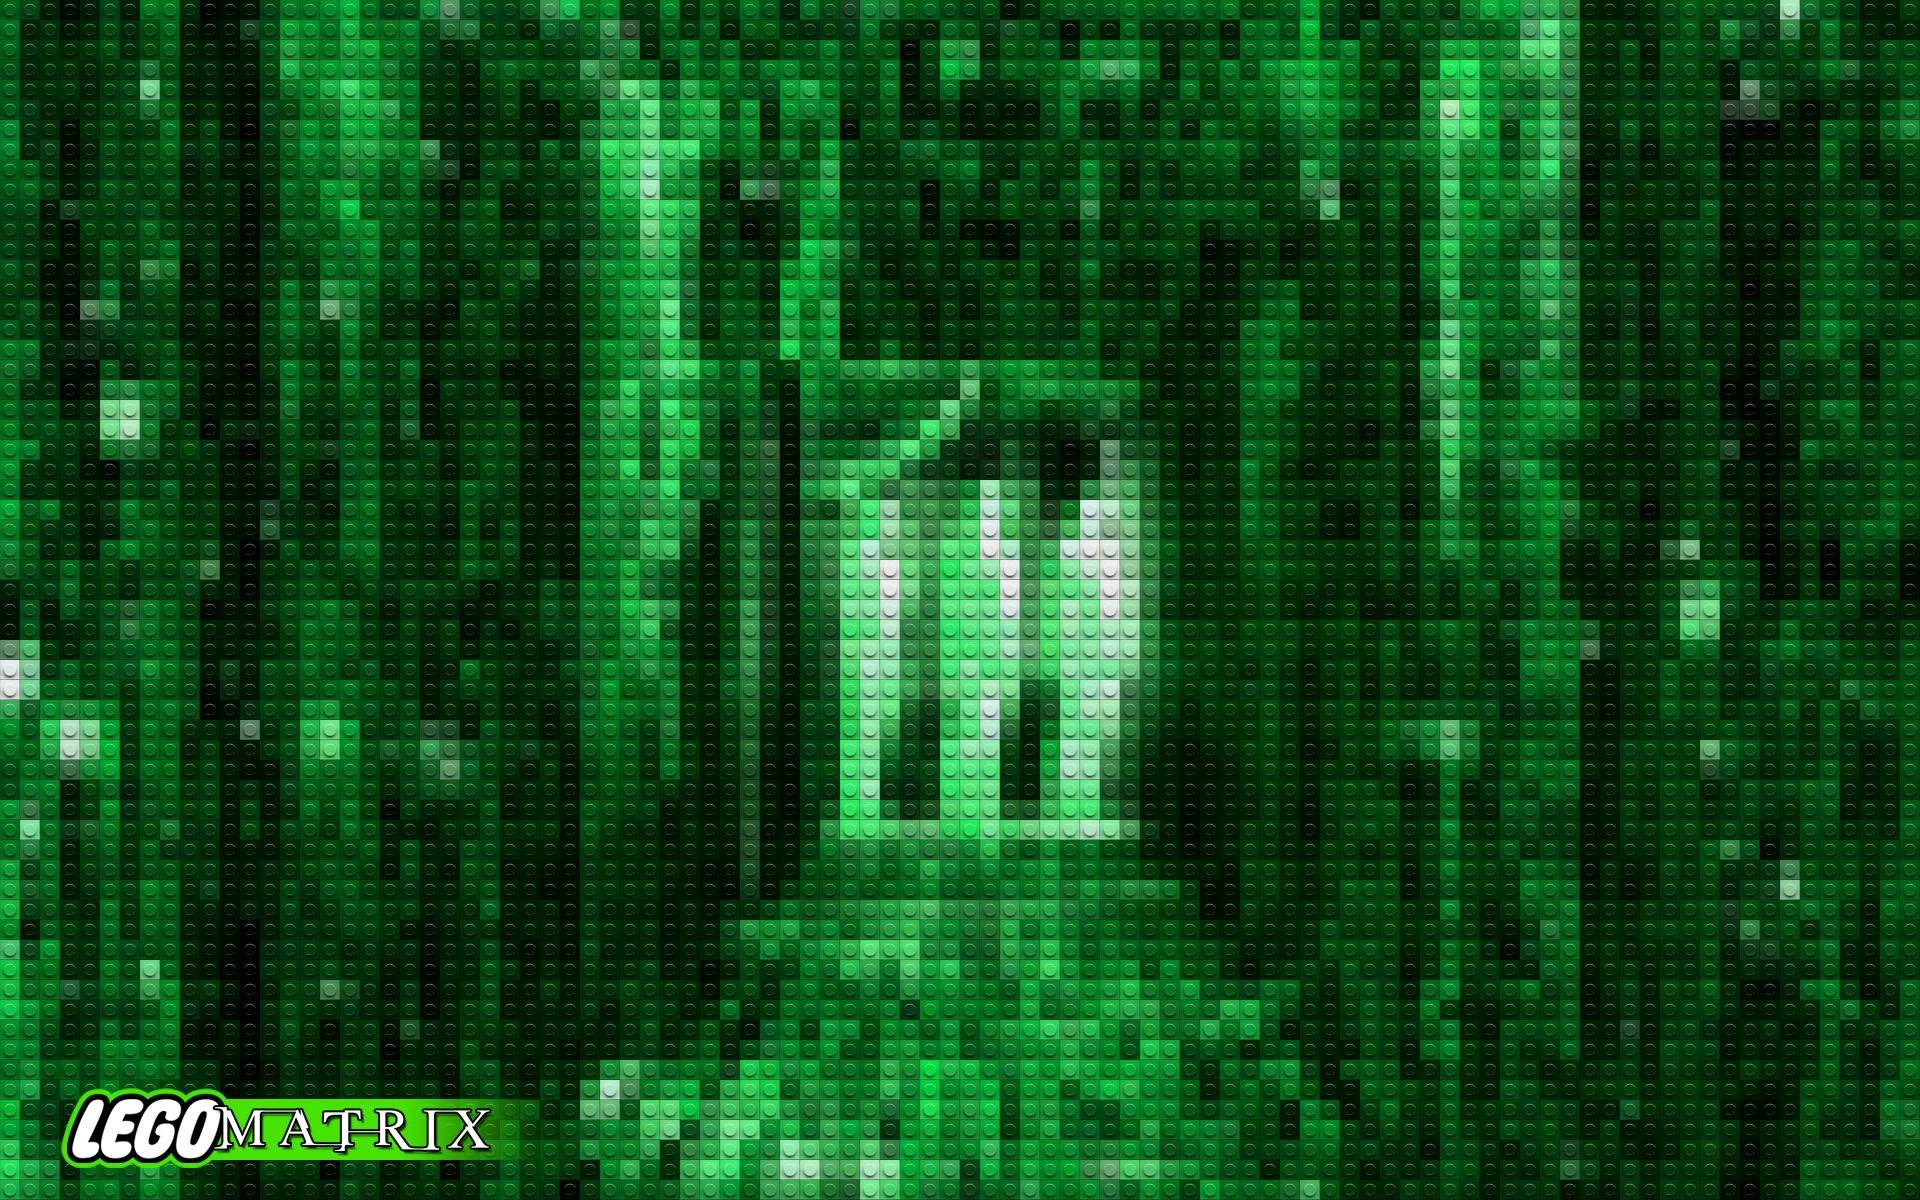 Iphone X Wallpaper Gif Landscape Matrix Backgrounds 69 Images